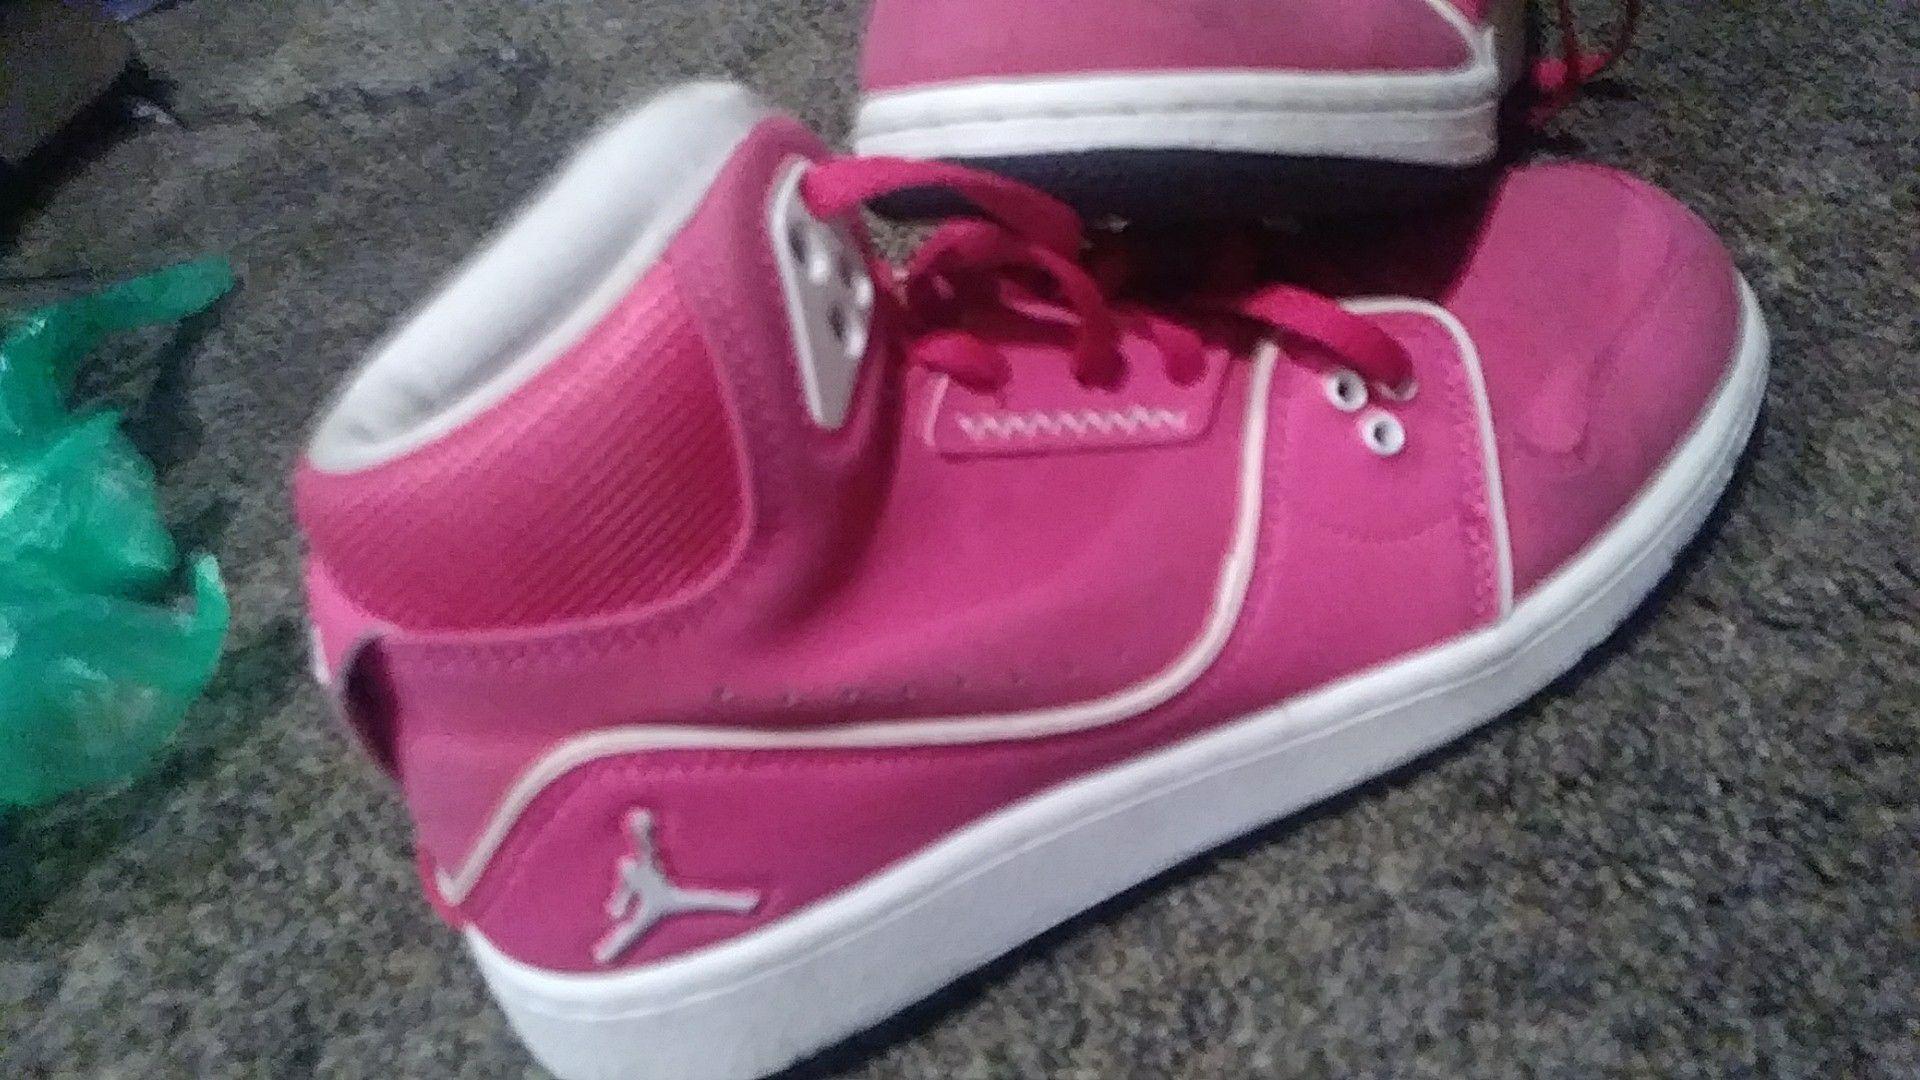 Jordans 5.5